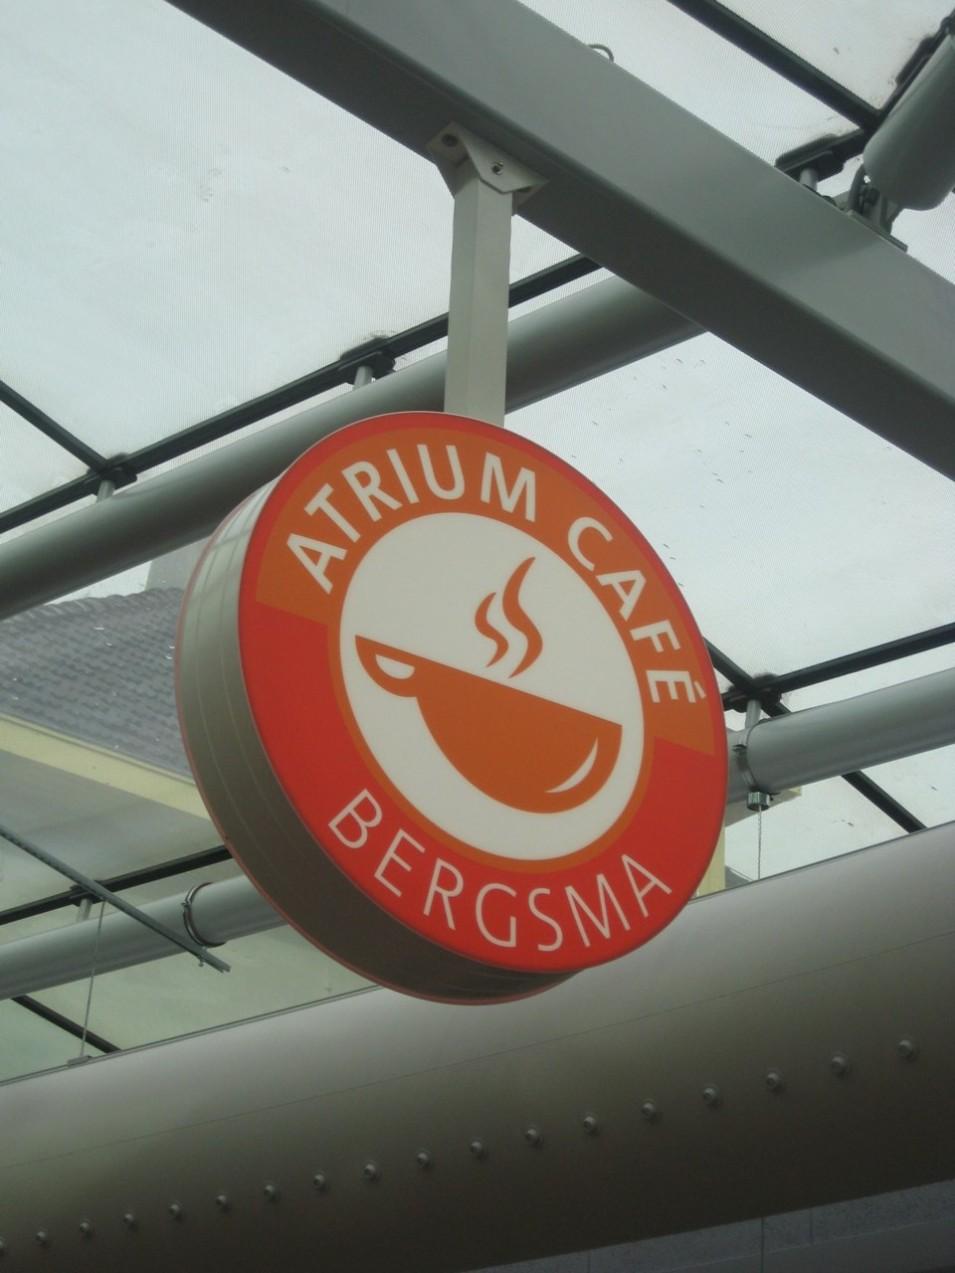 http://www.frieslandreclame.nl/wp-content/uploads/2015/03/atrium-cafe-955x1273.jpg